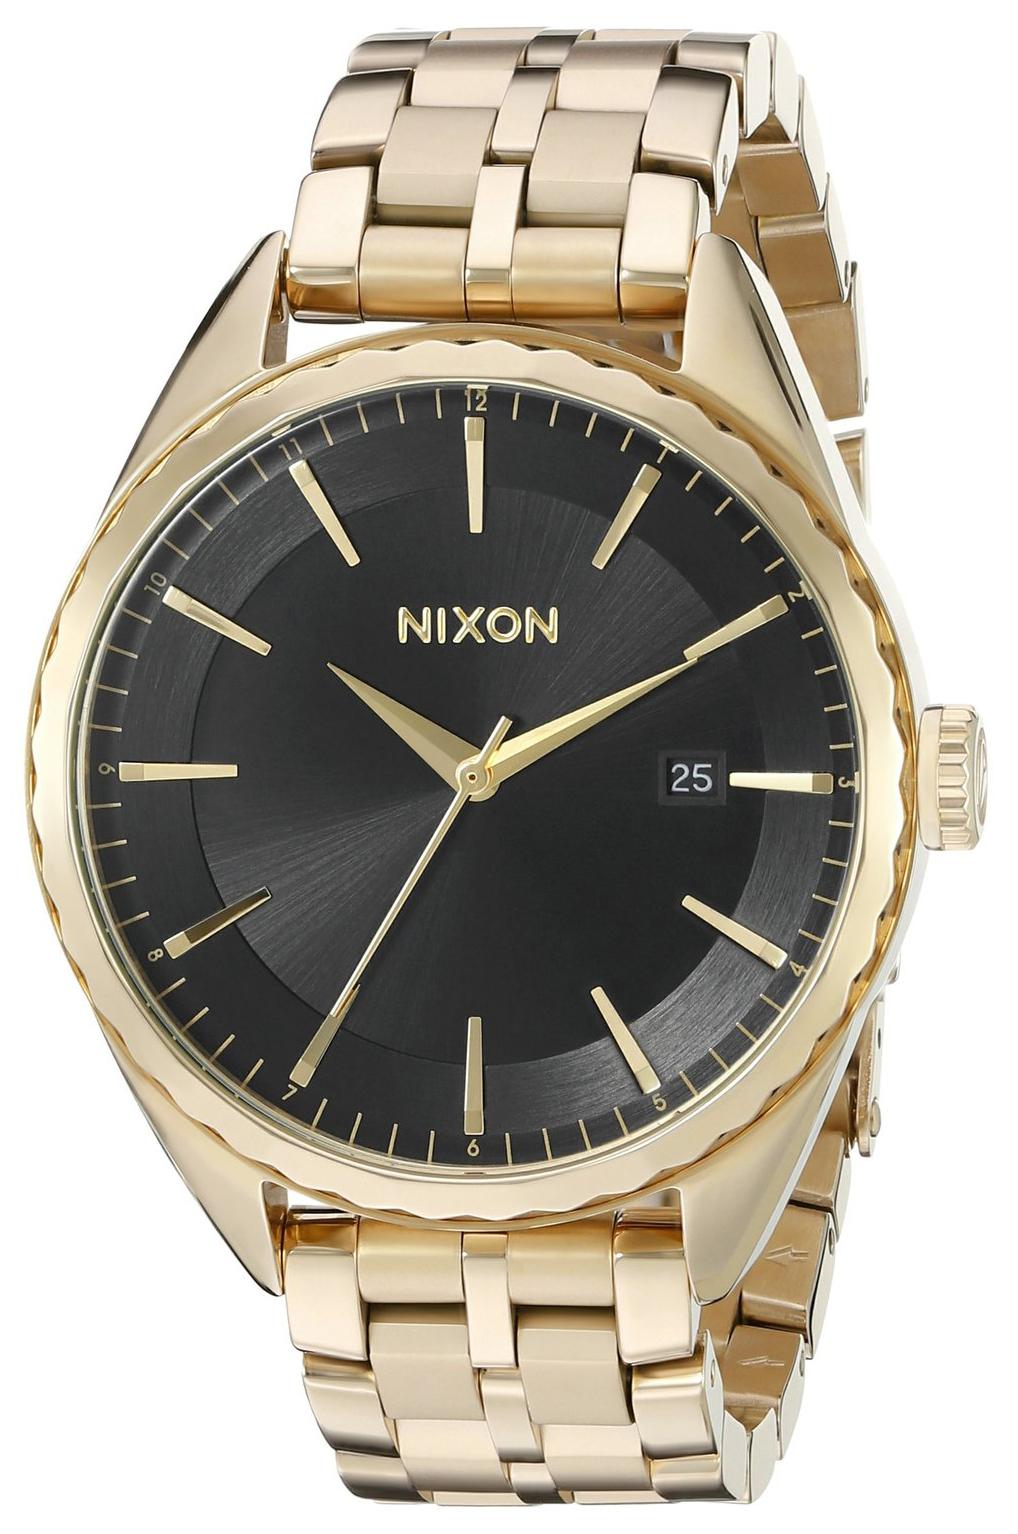 Nixon 99999 Dameklokke A9342042-00 Sort/Gulltonet stål Ø39 mm - Nixon